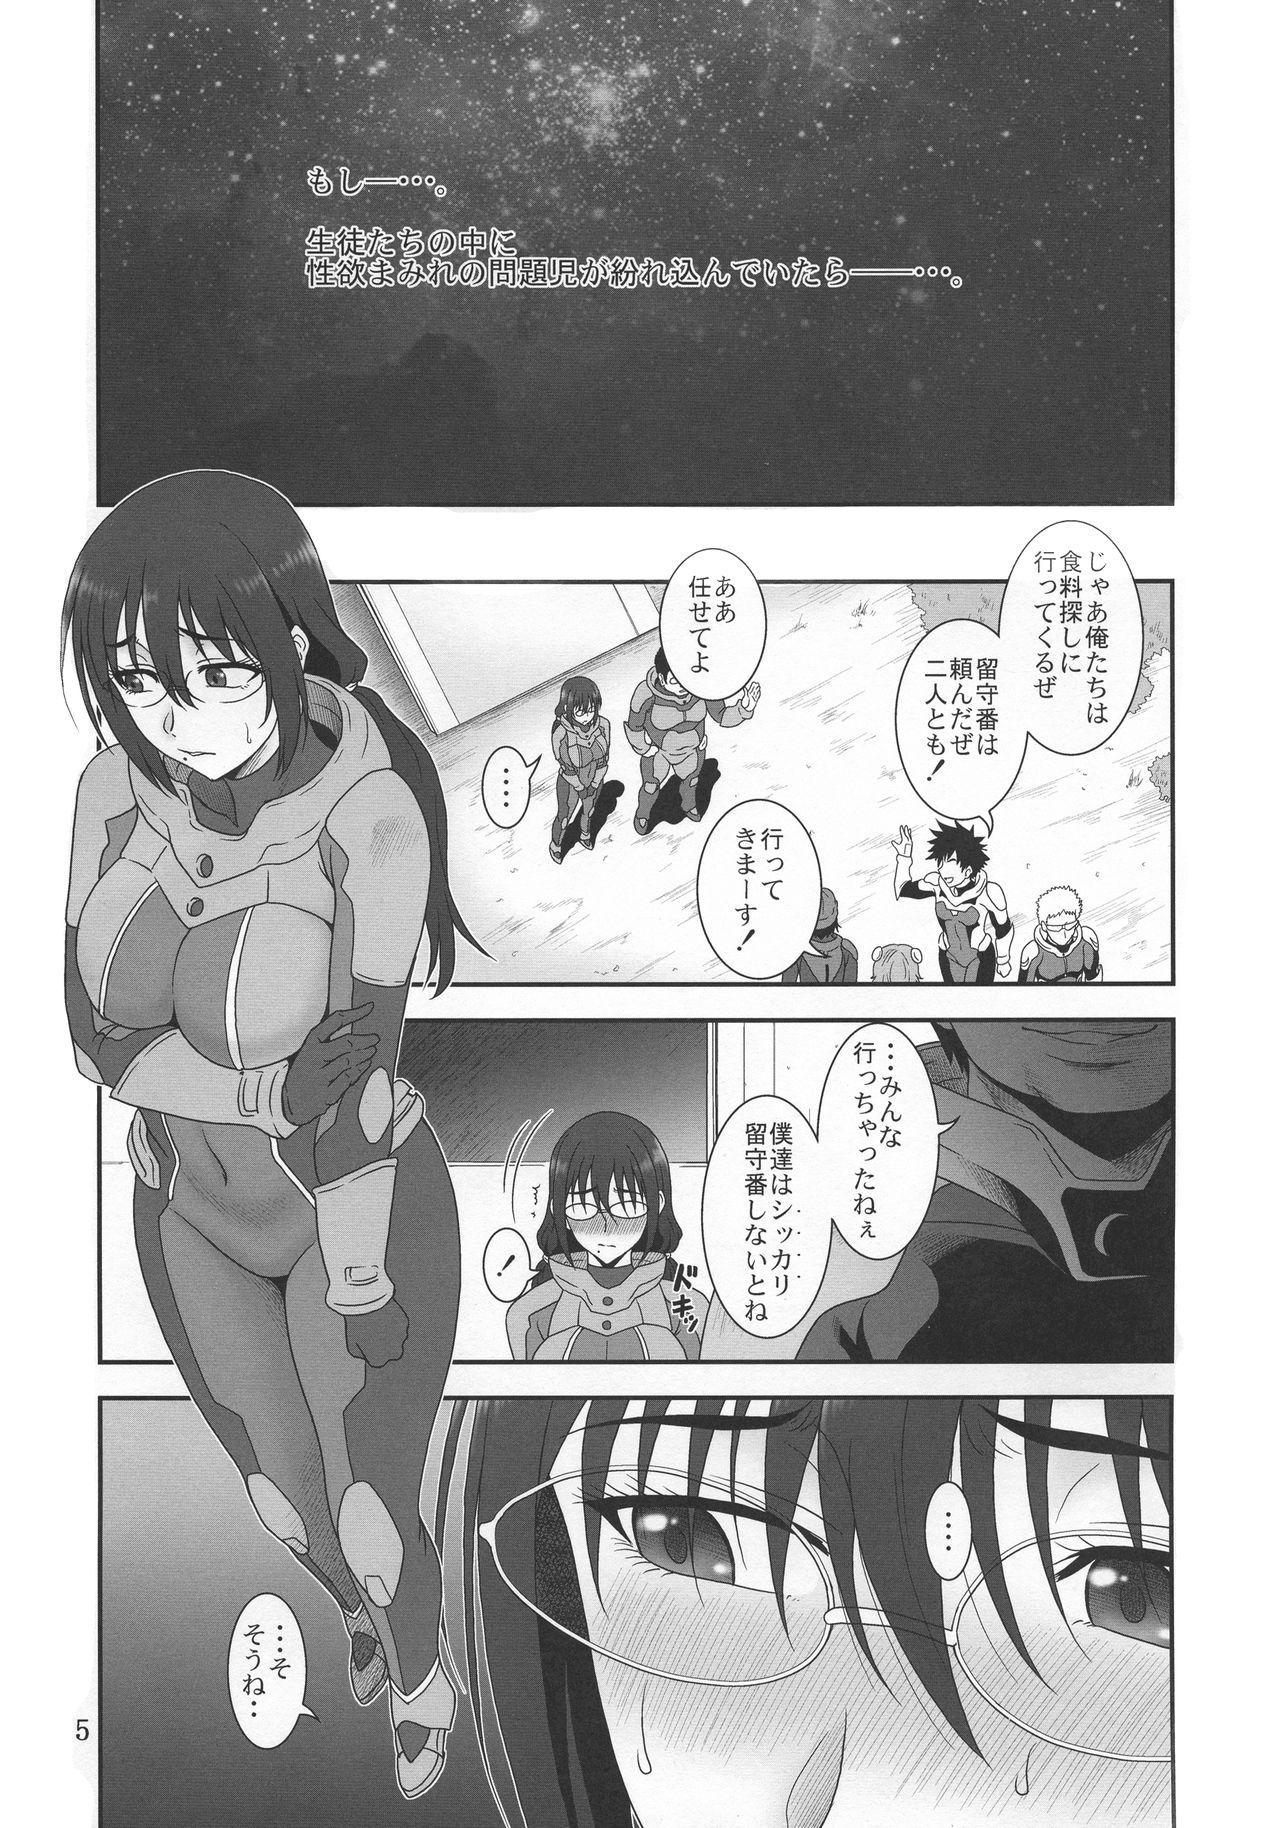 Kyuukyou no Wakusei - Planet of plight 3